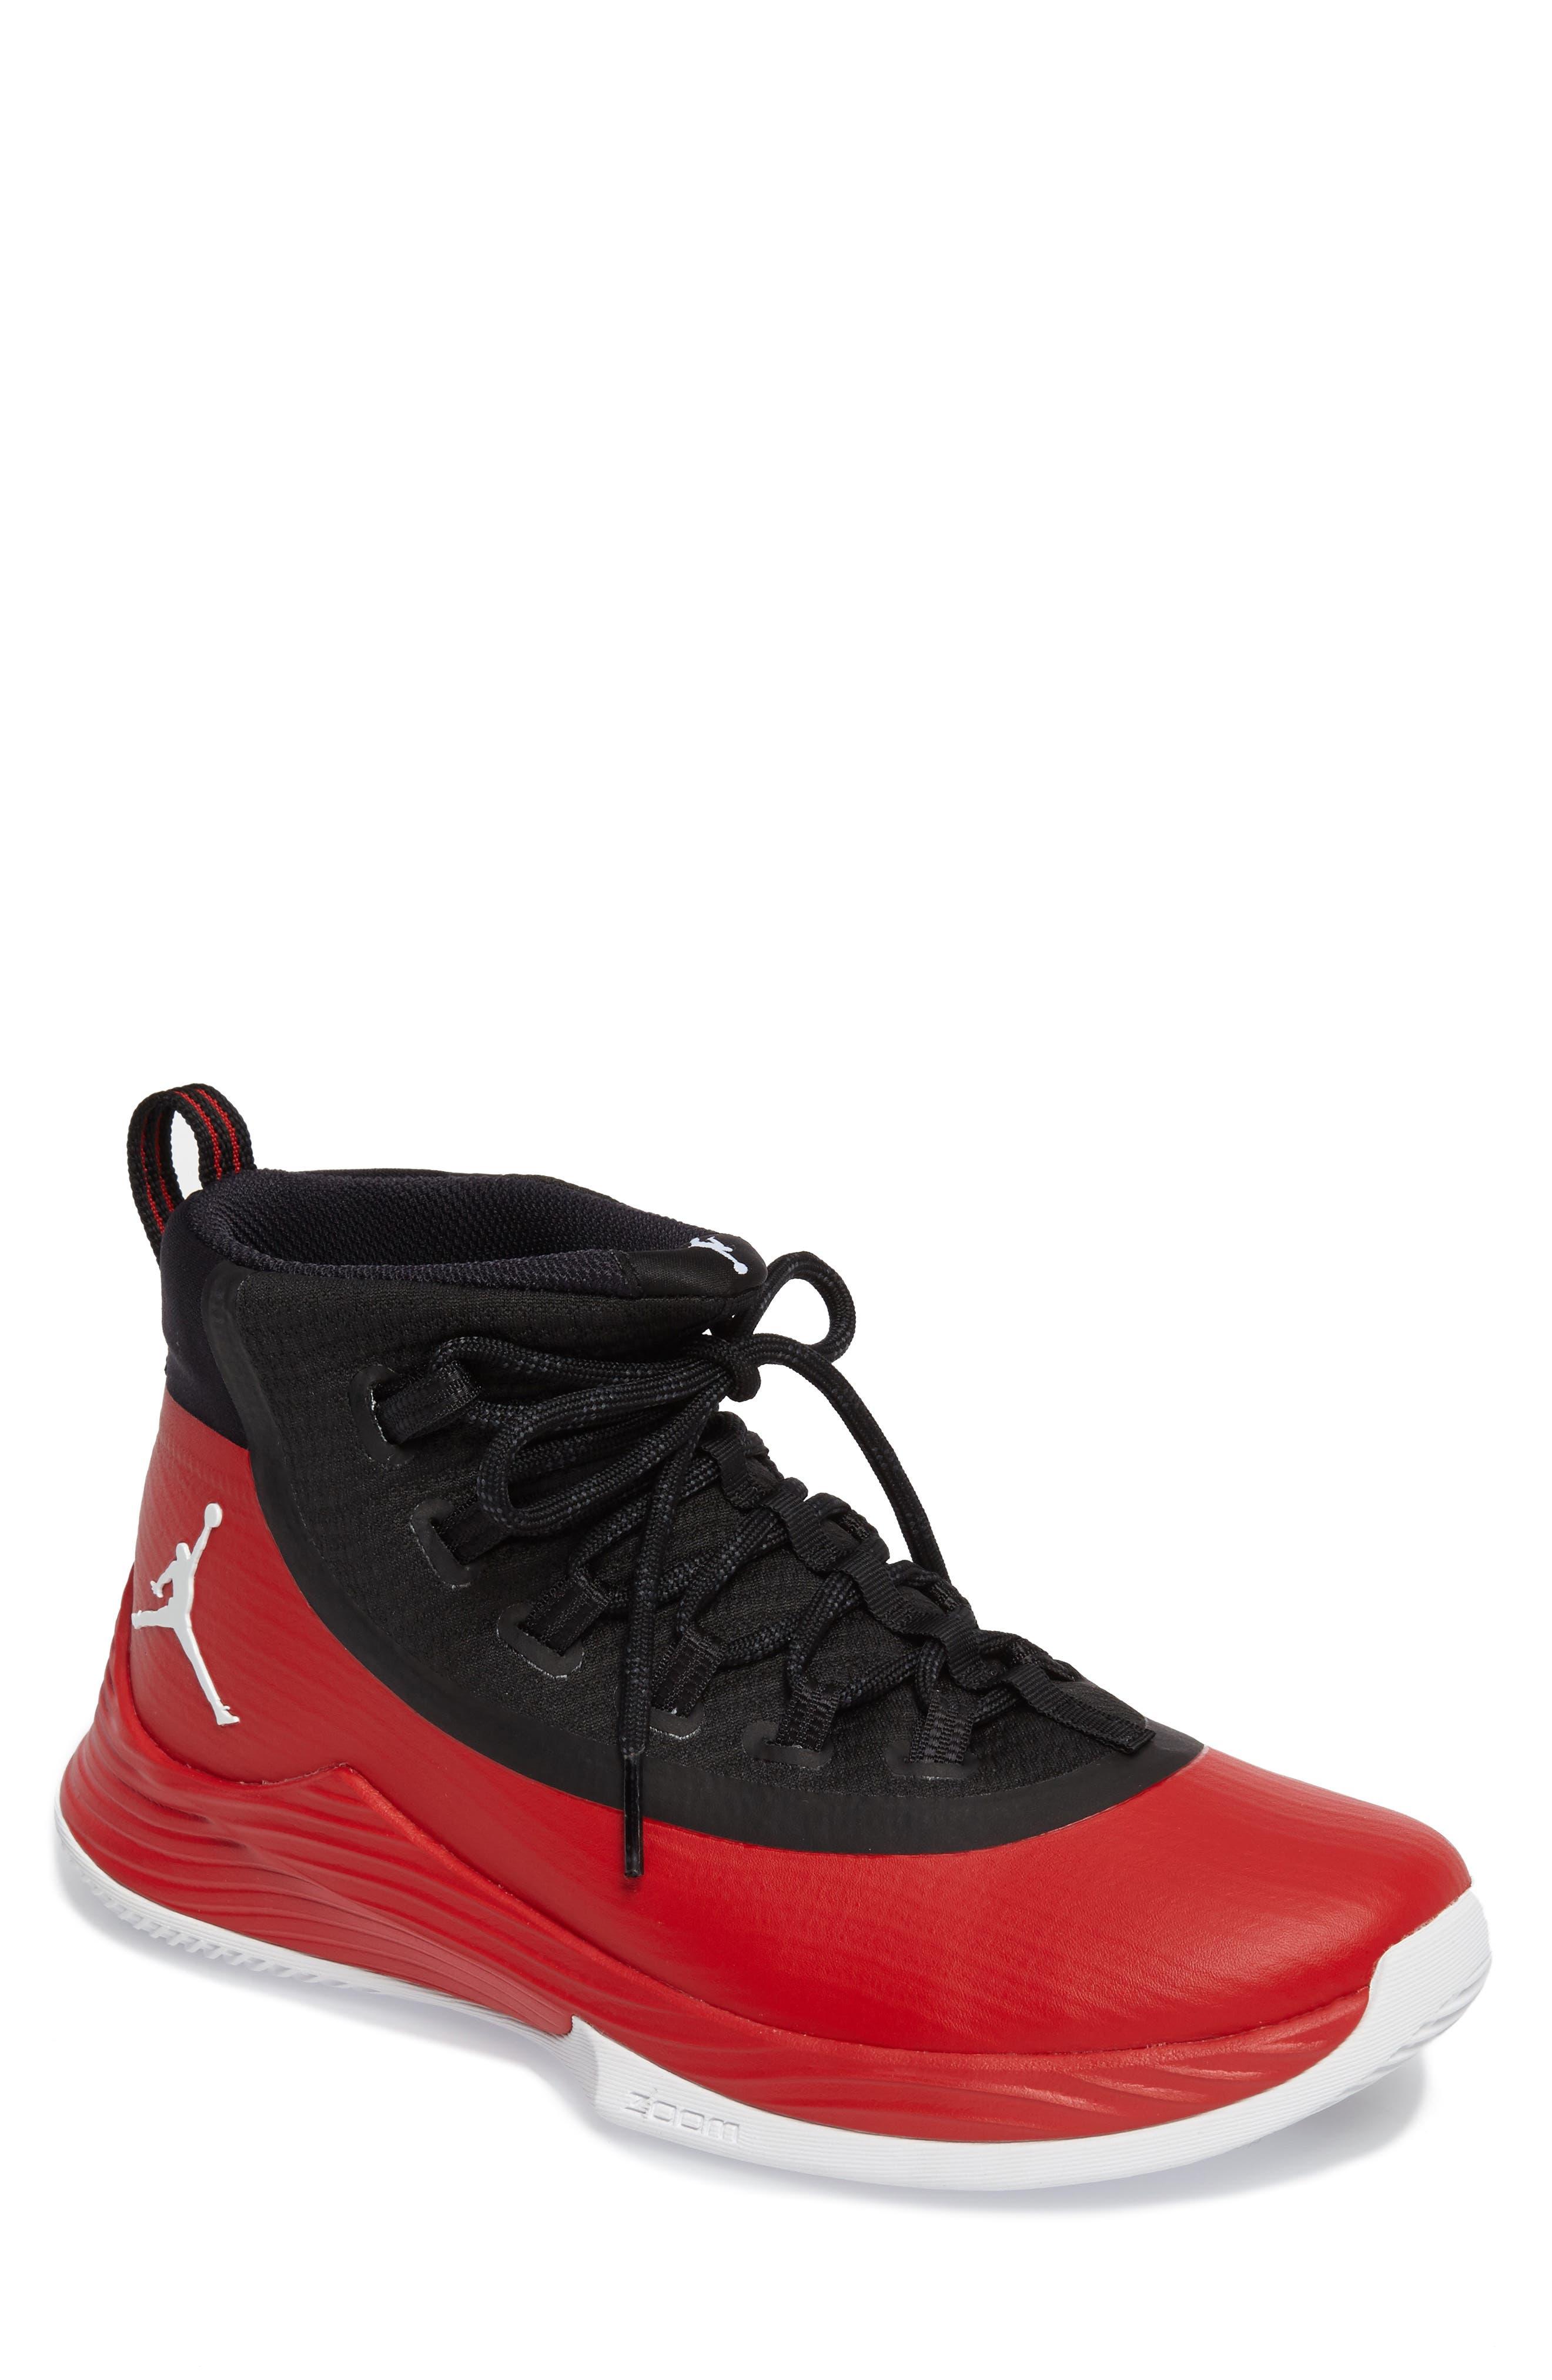 Jordan Ultra Fly 2 Basketball Shoe,                             Main thumbnail 1, color,                             University Red/ White/ Black